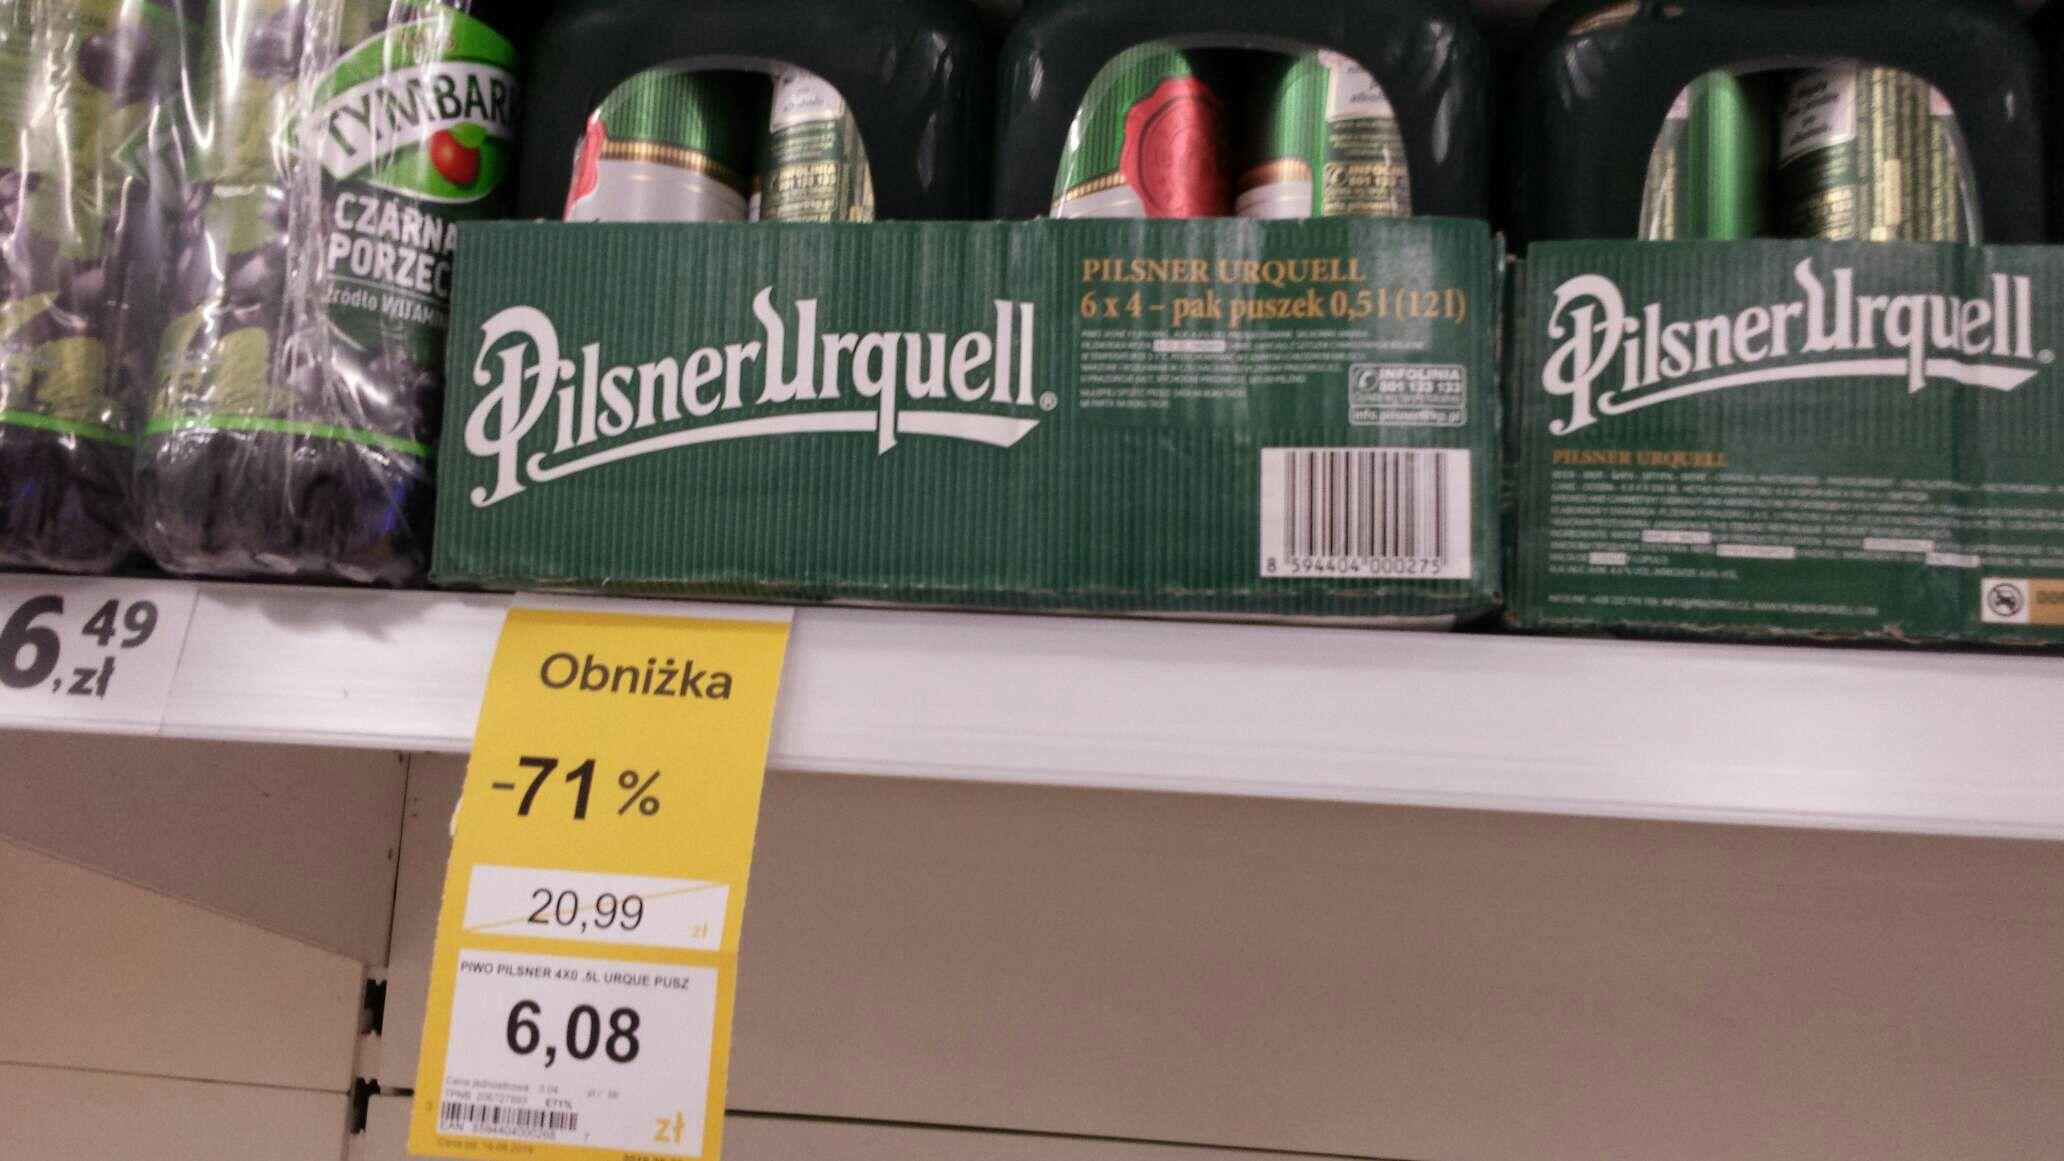 Ponownie piwo 4pak Pilsner Urquel